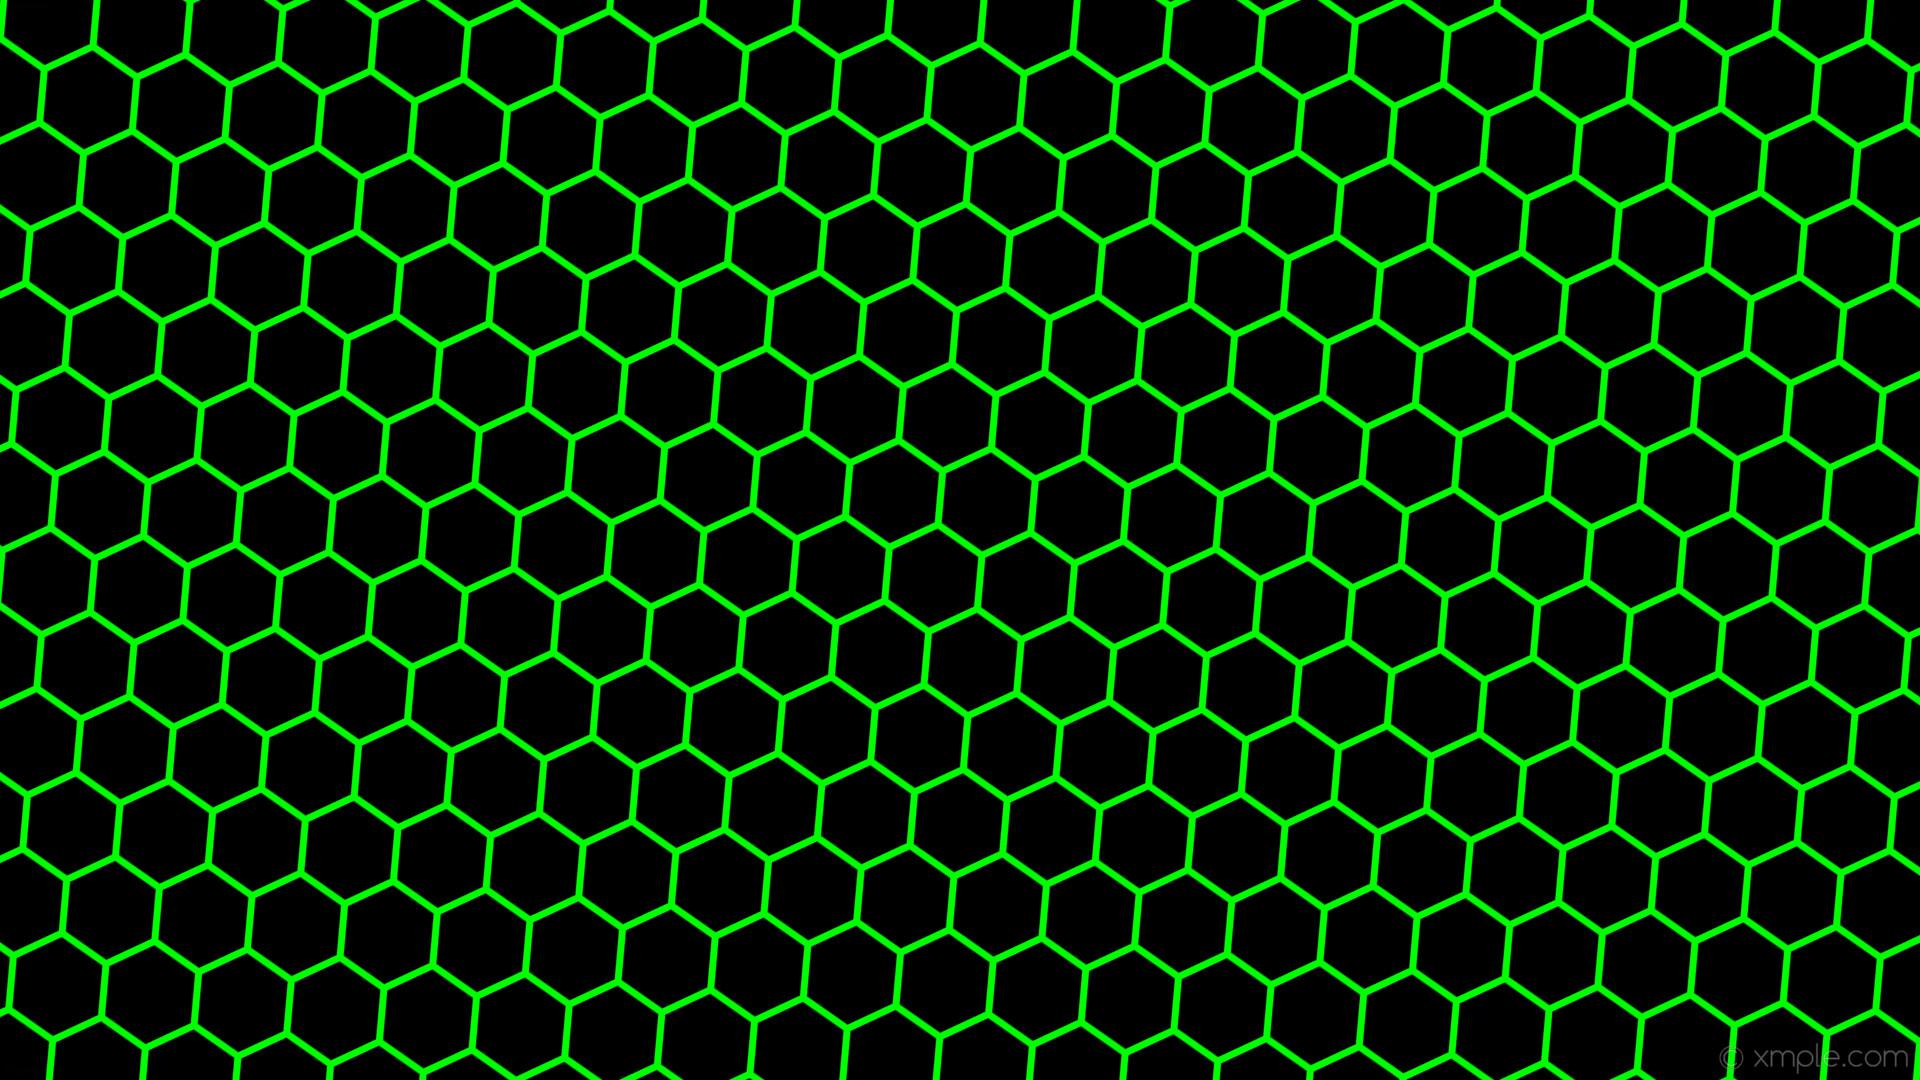 wallpaper honeycomb black beehive hexagon green lime #000000 #00ff00  diagonal 55° 7px 93px